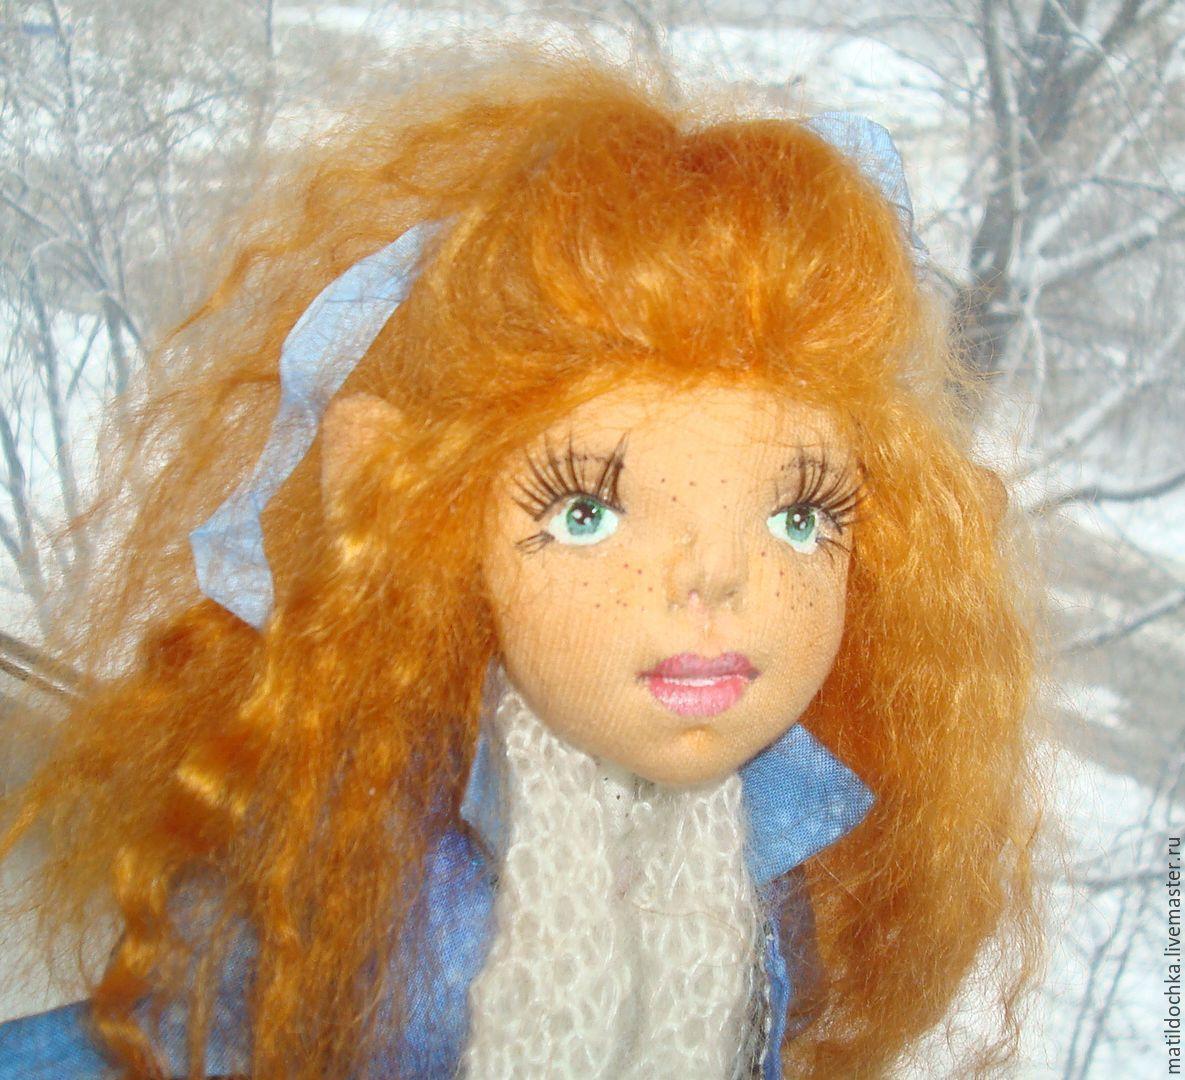 Кукла Эльфиечка. Фото №2